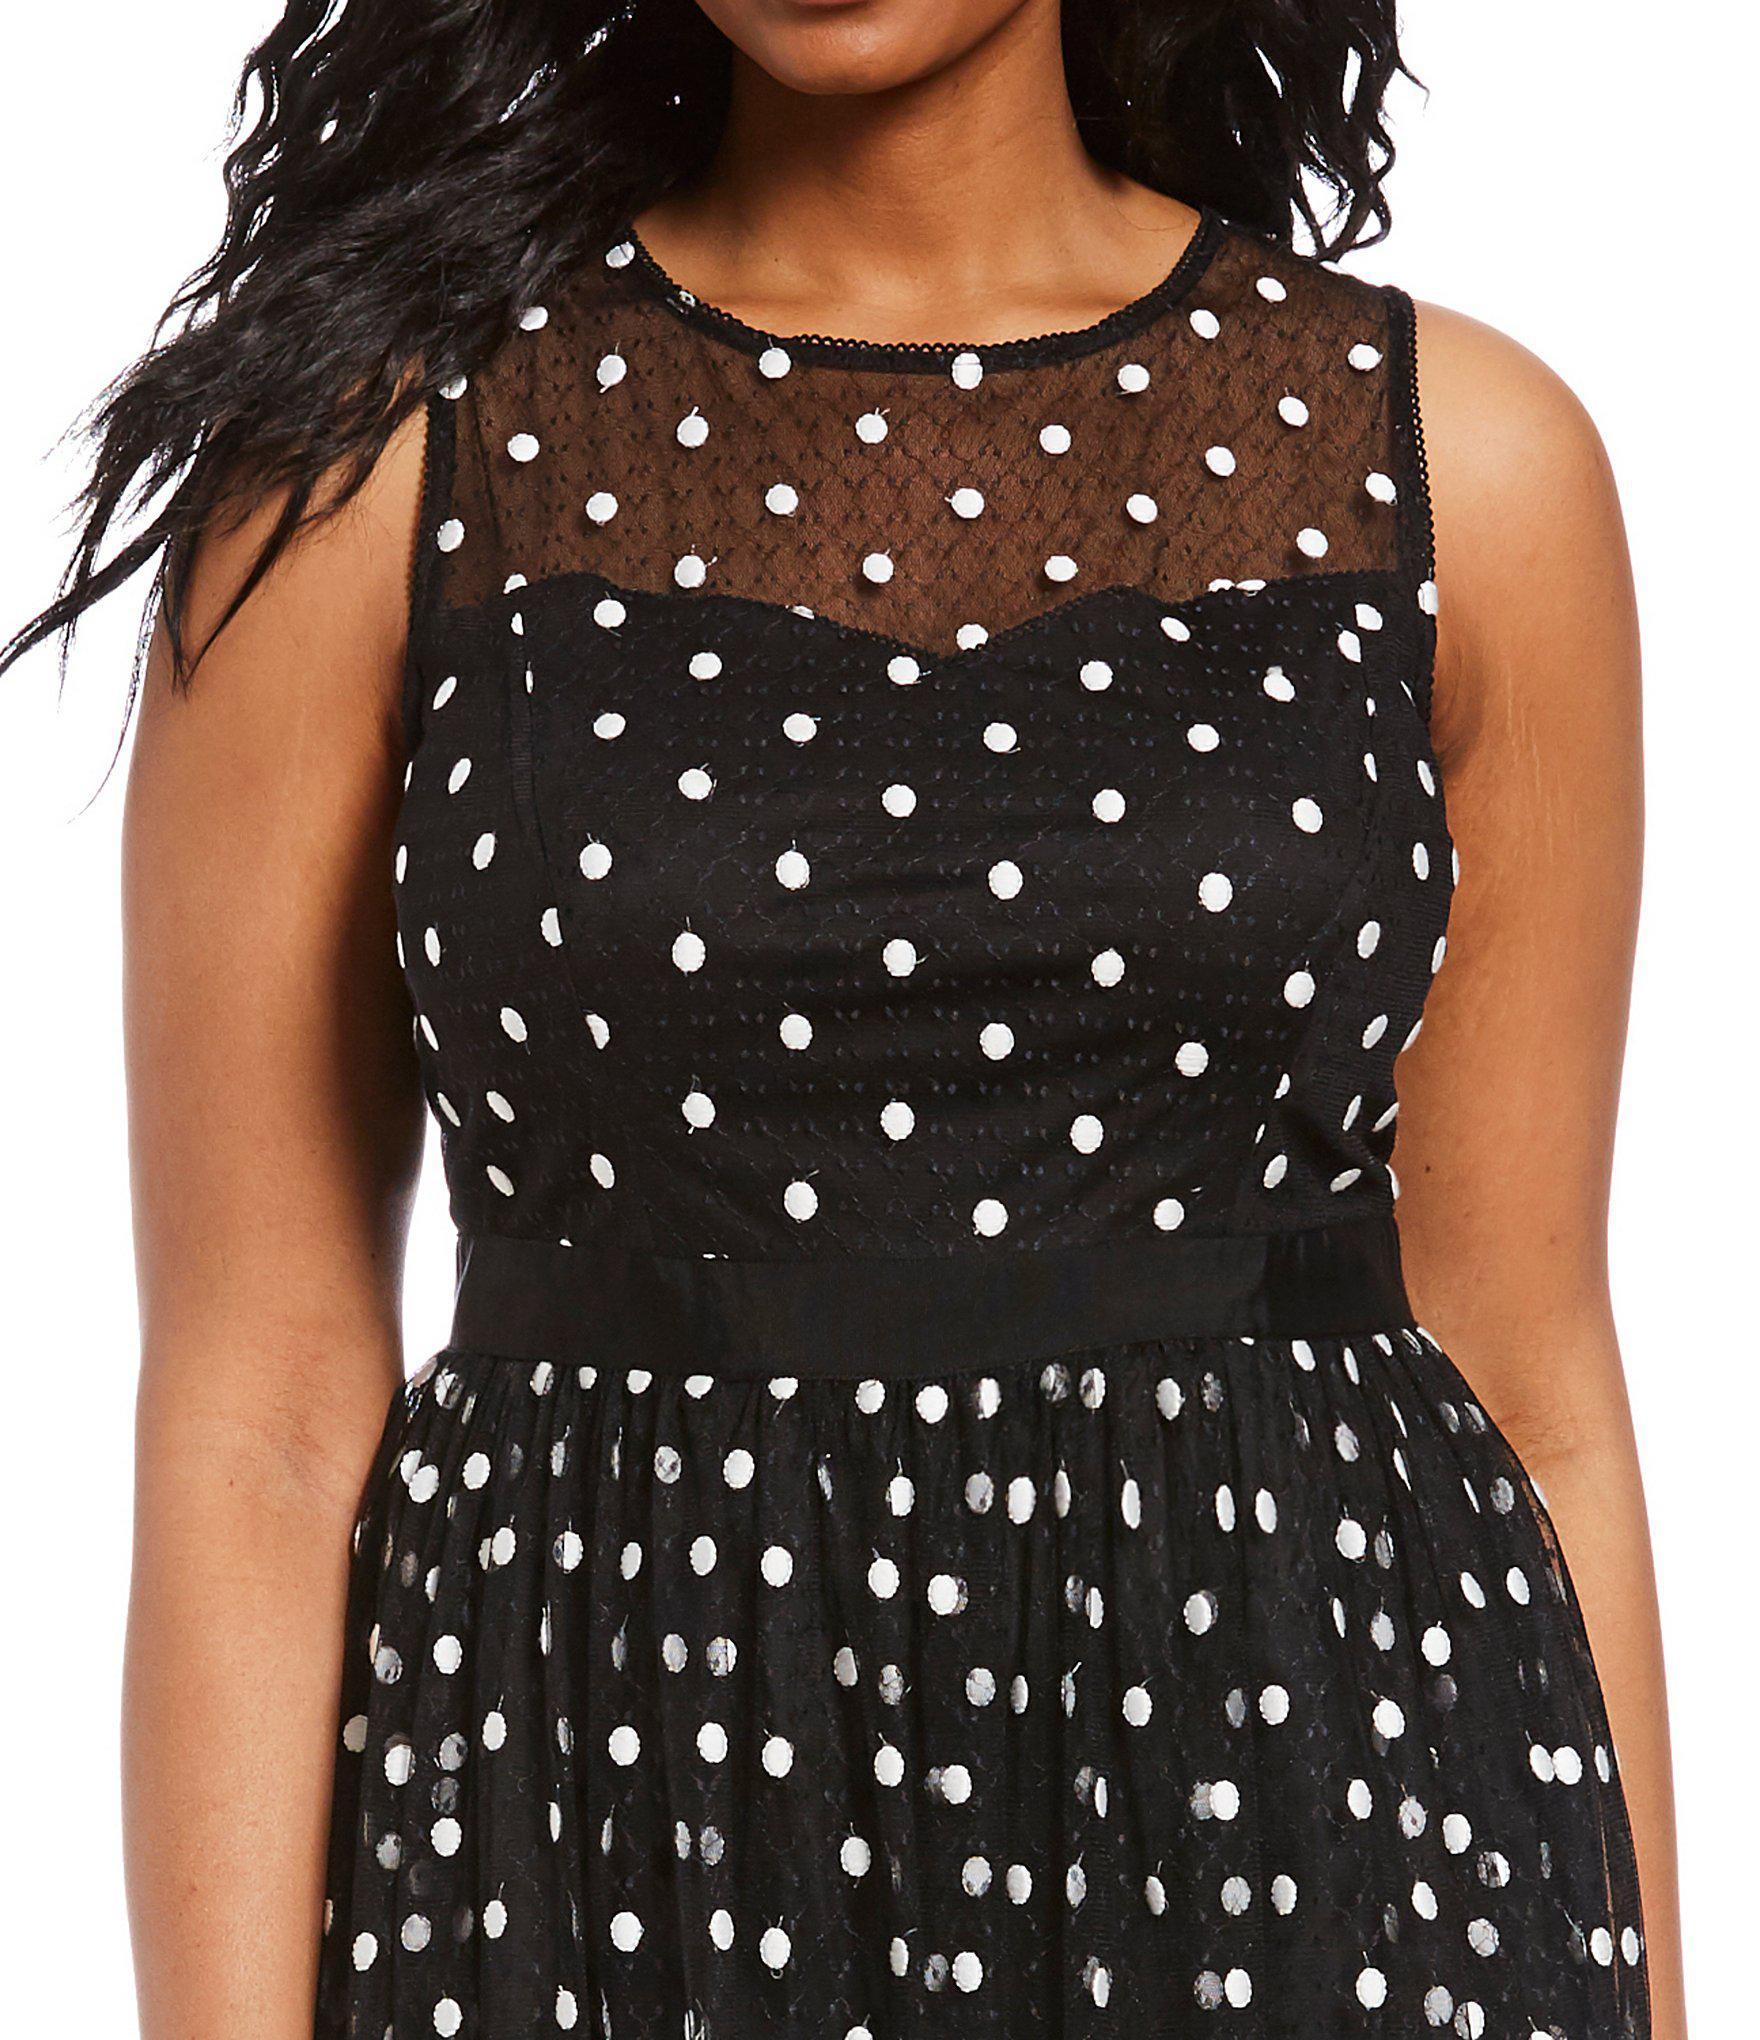 White Plus Size Dresses At Dillards - raveitsafe